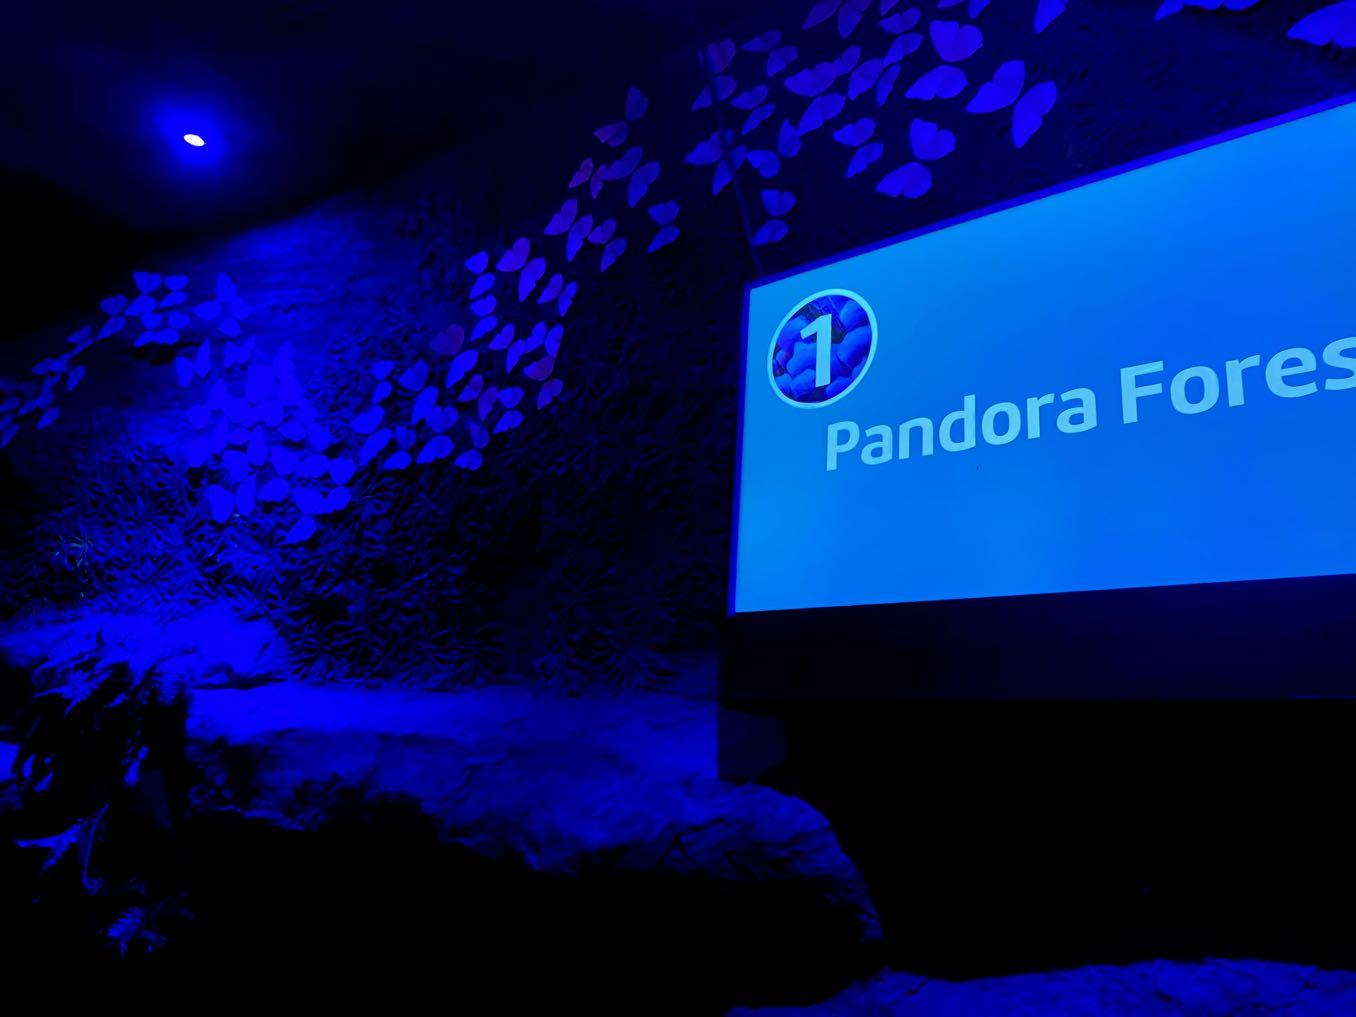 Pandora Forest